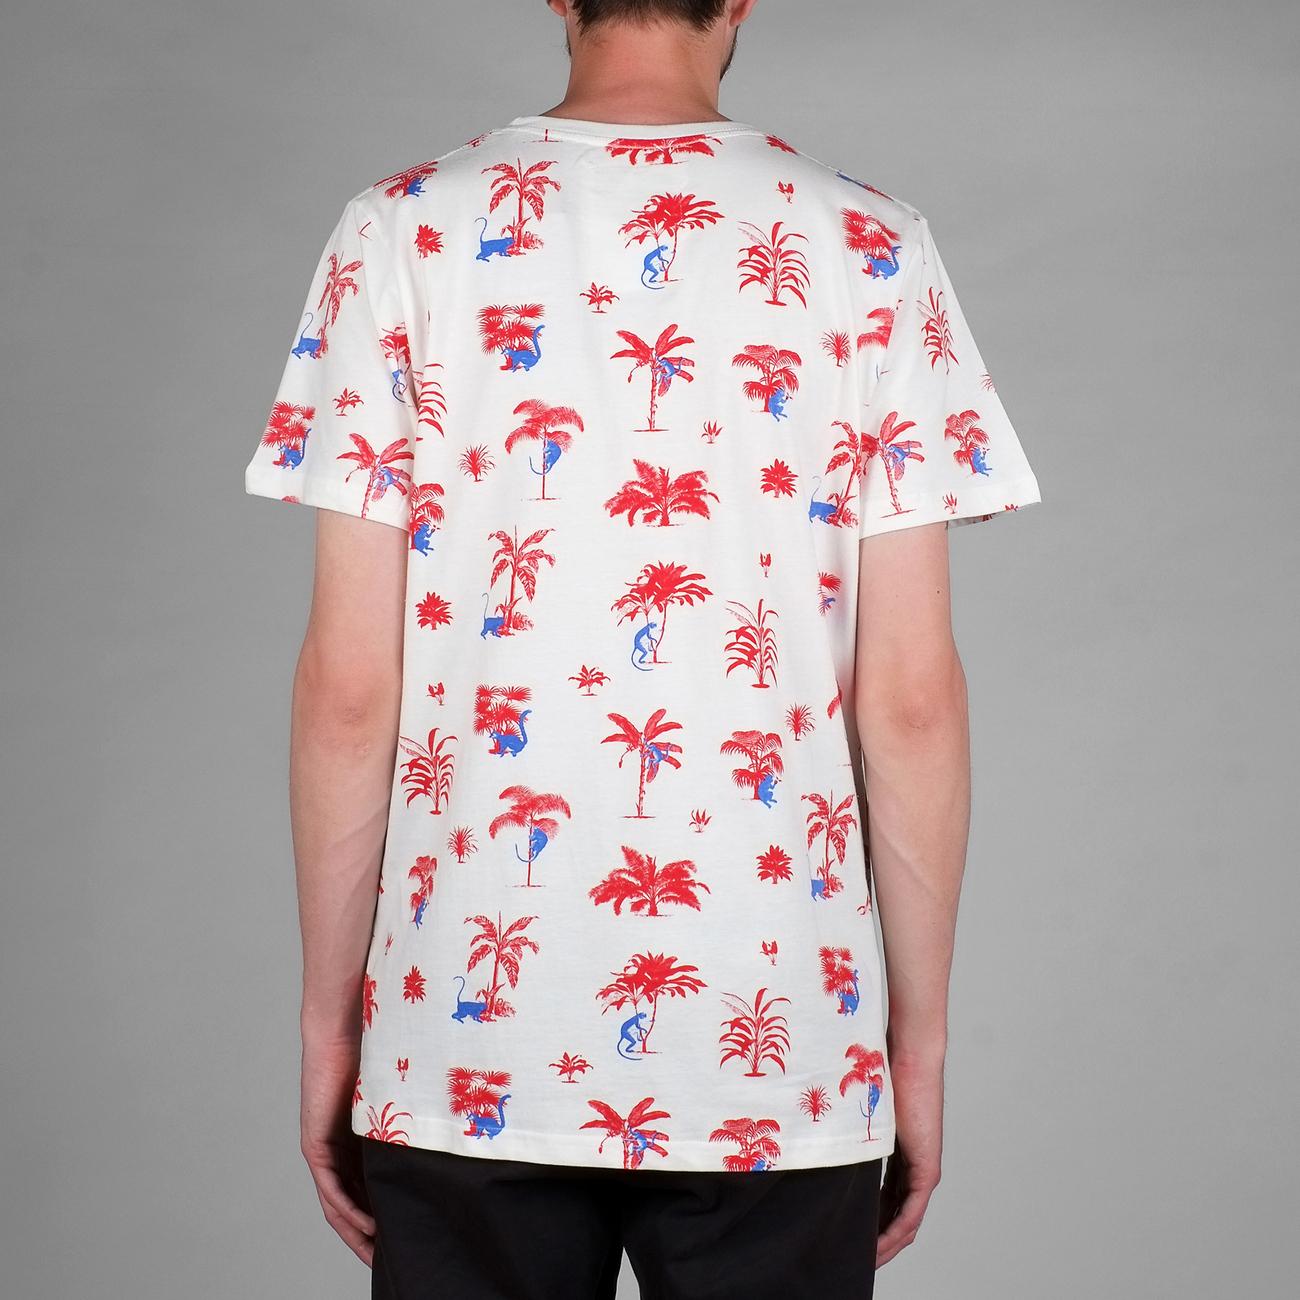 T-shirt Stockholm Monkey Trees